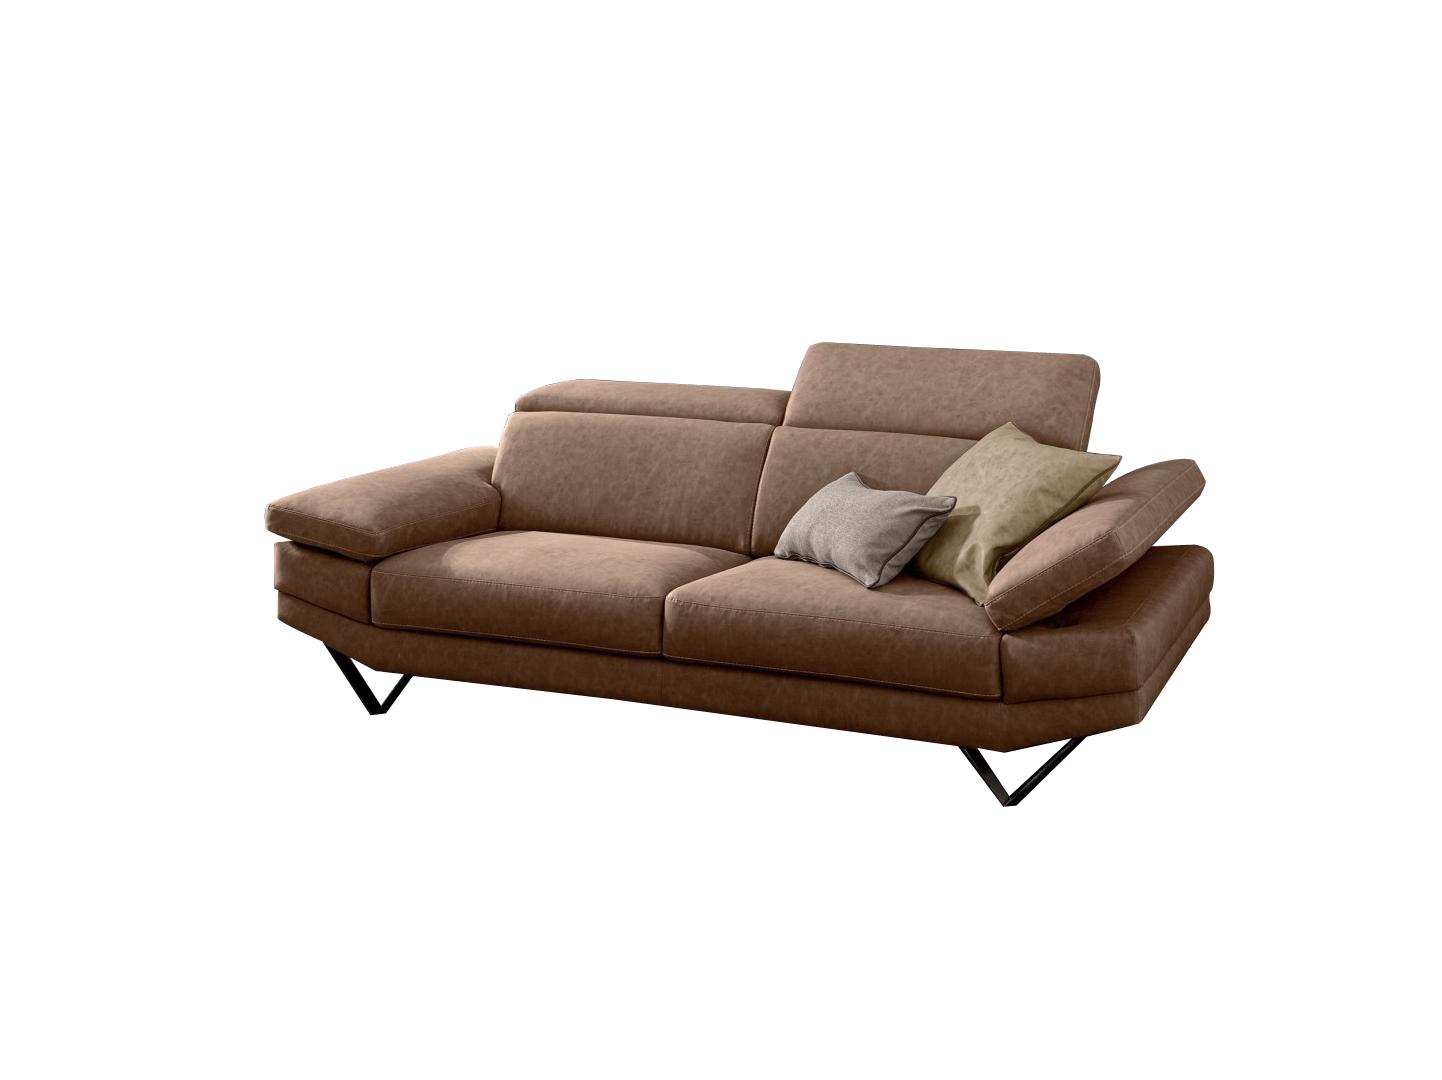 Canapea fixa 3 locuri tapitata cu texil Howard, l230xA105xH78 cm